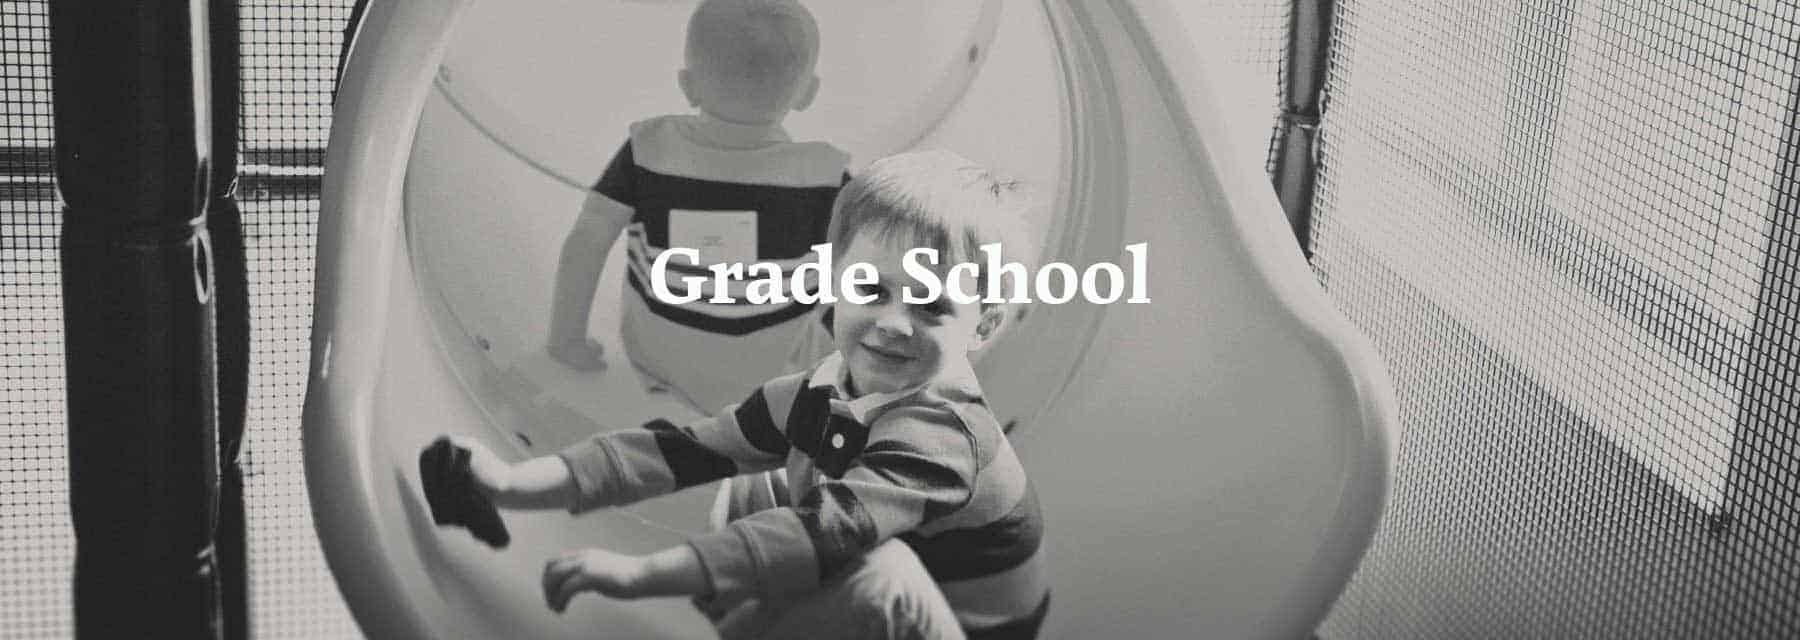 grade_school